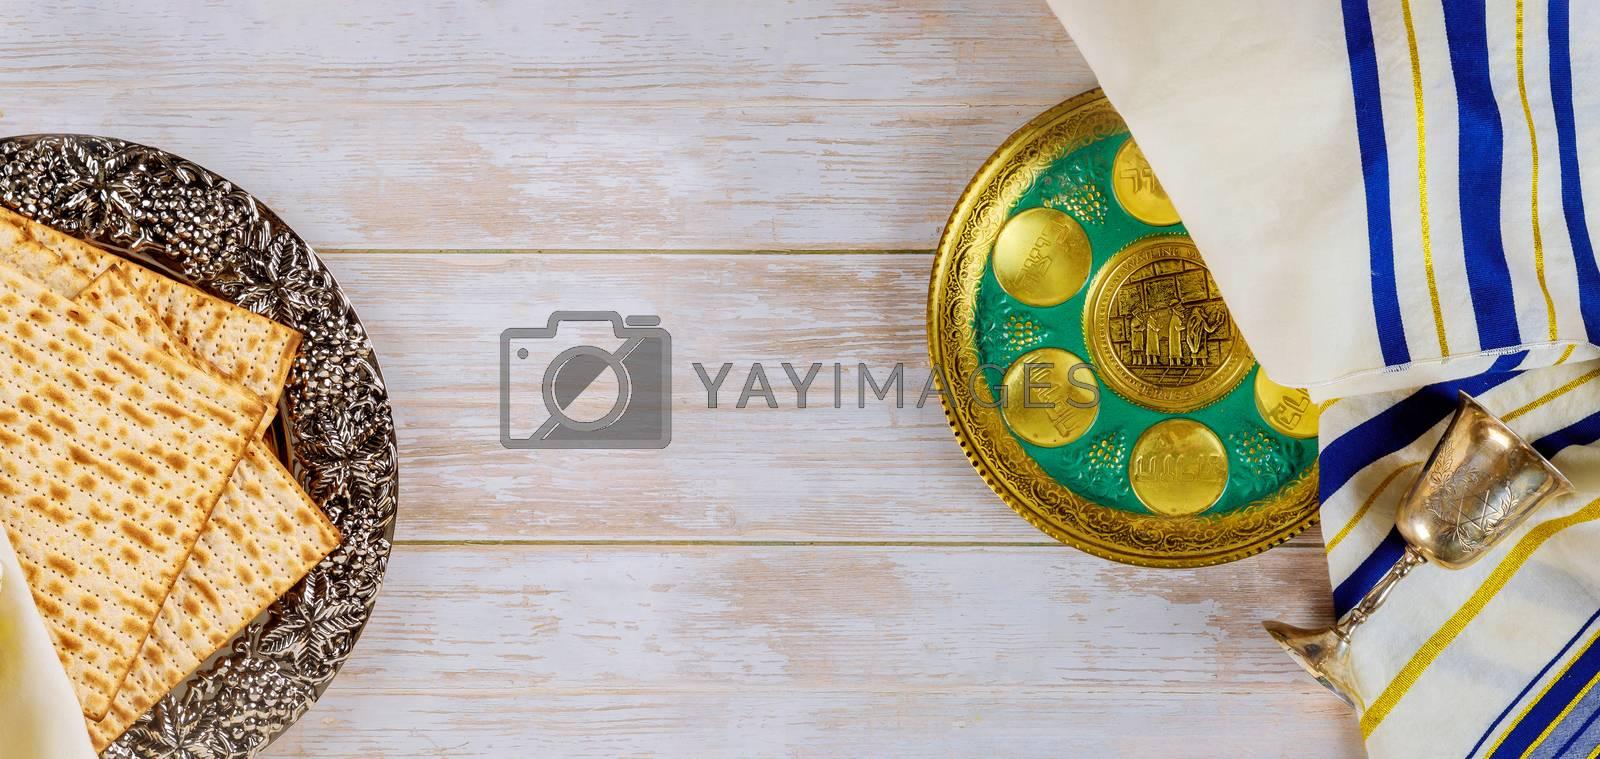 Passover jewish holiday celebration matzah, kiddush and seder with text in hebrew egg, bone, herbs, karpas, chazeret and charoset.